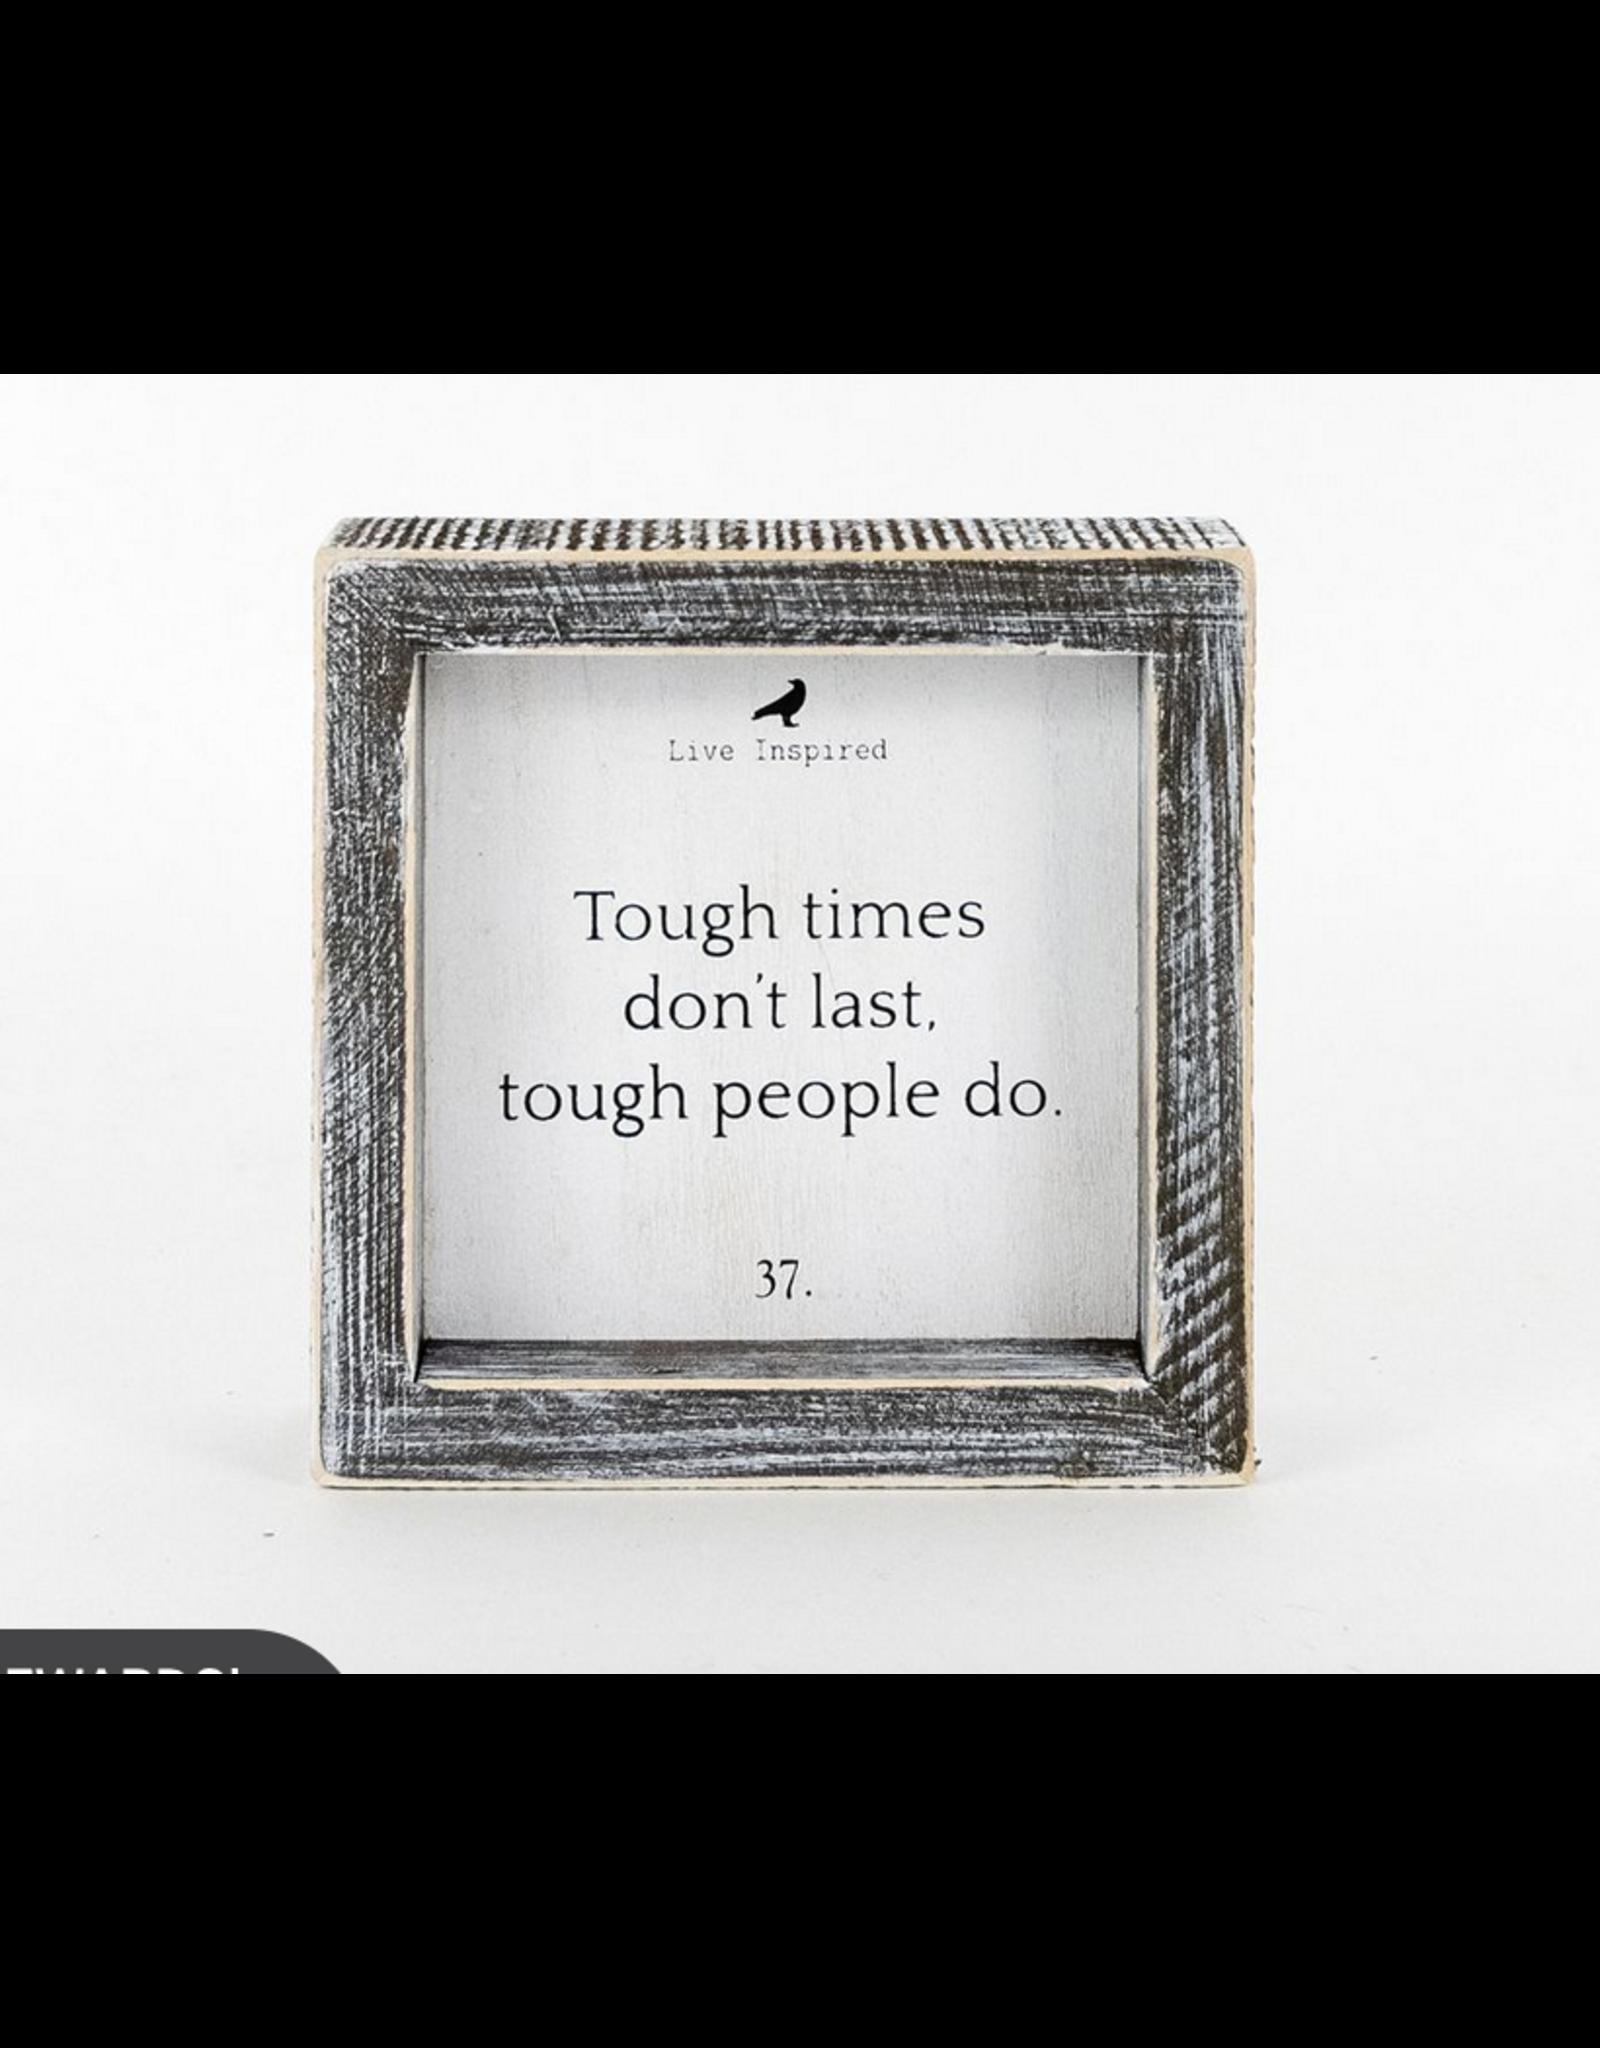 Adams & Co. Tough Times, Tough People Sign